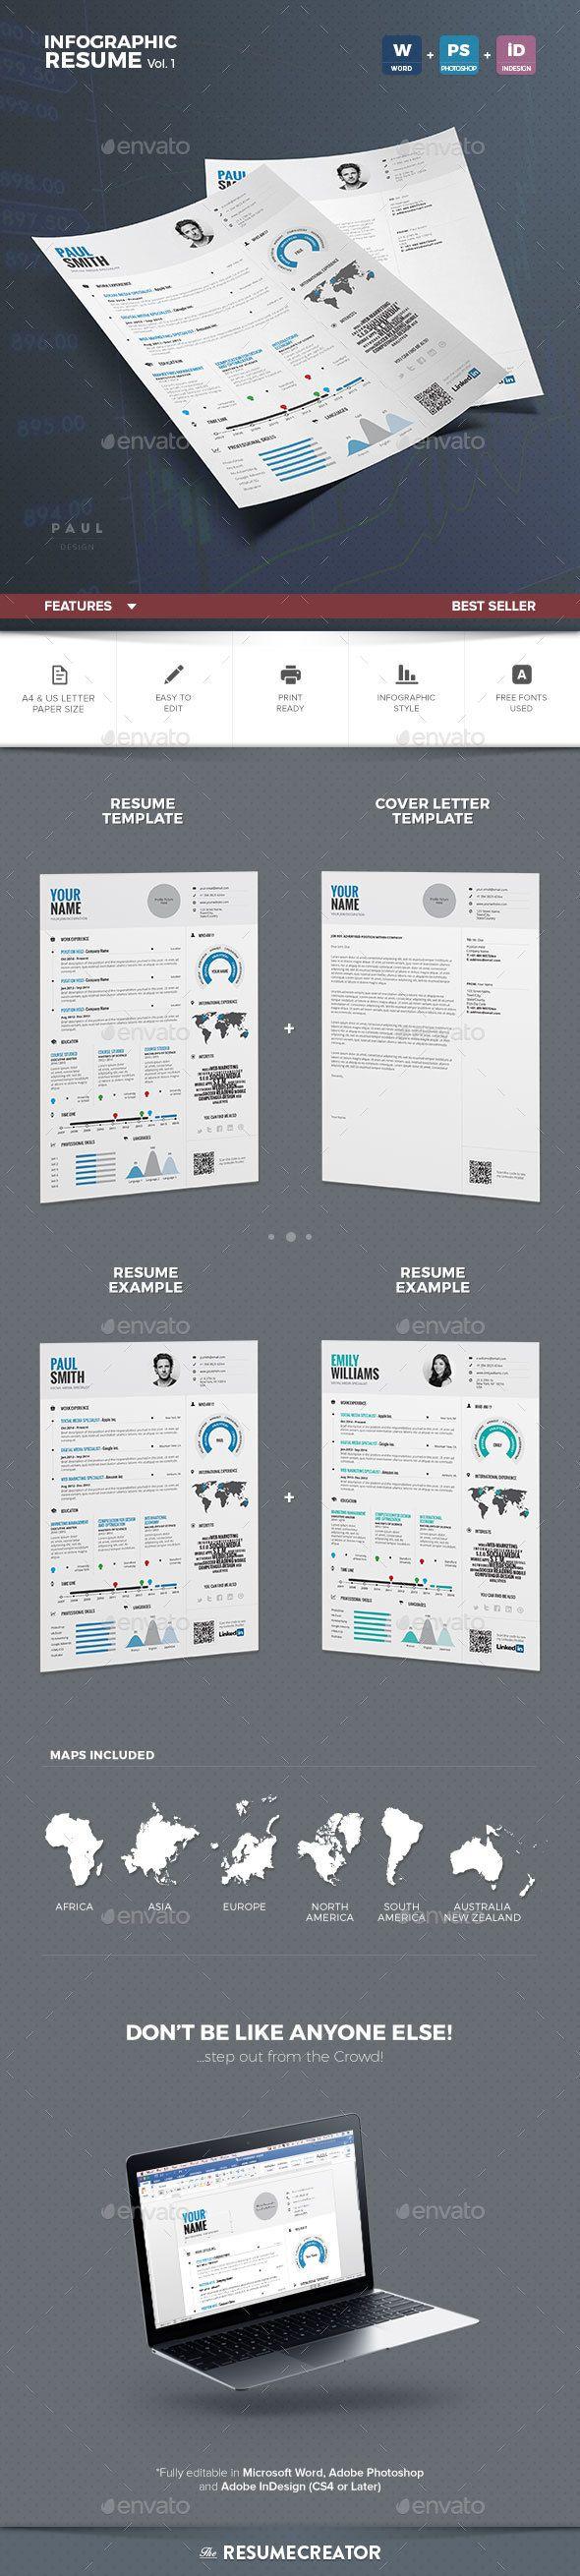 Infographic Resume Vol1 22 best Resume Templates